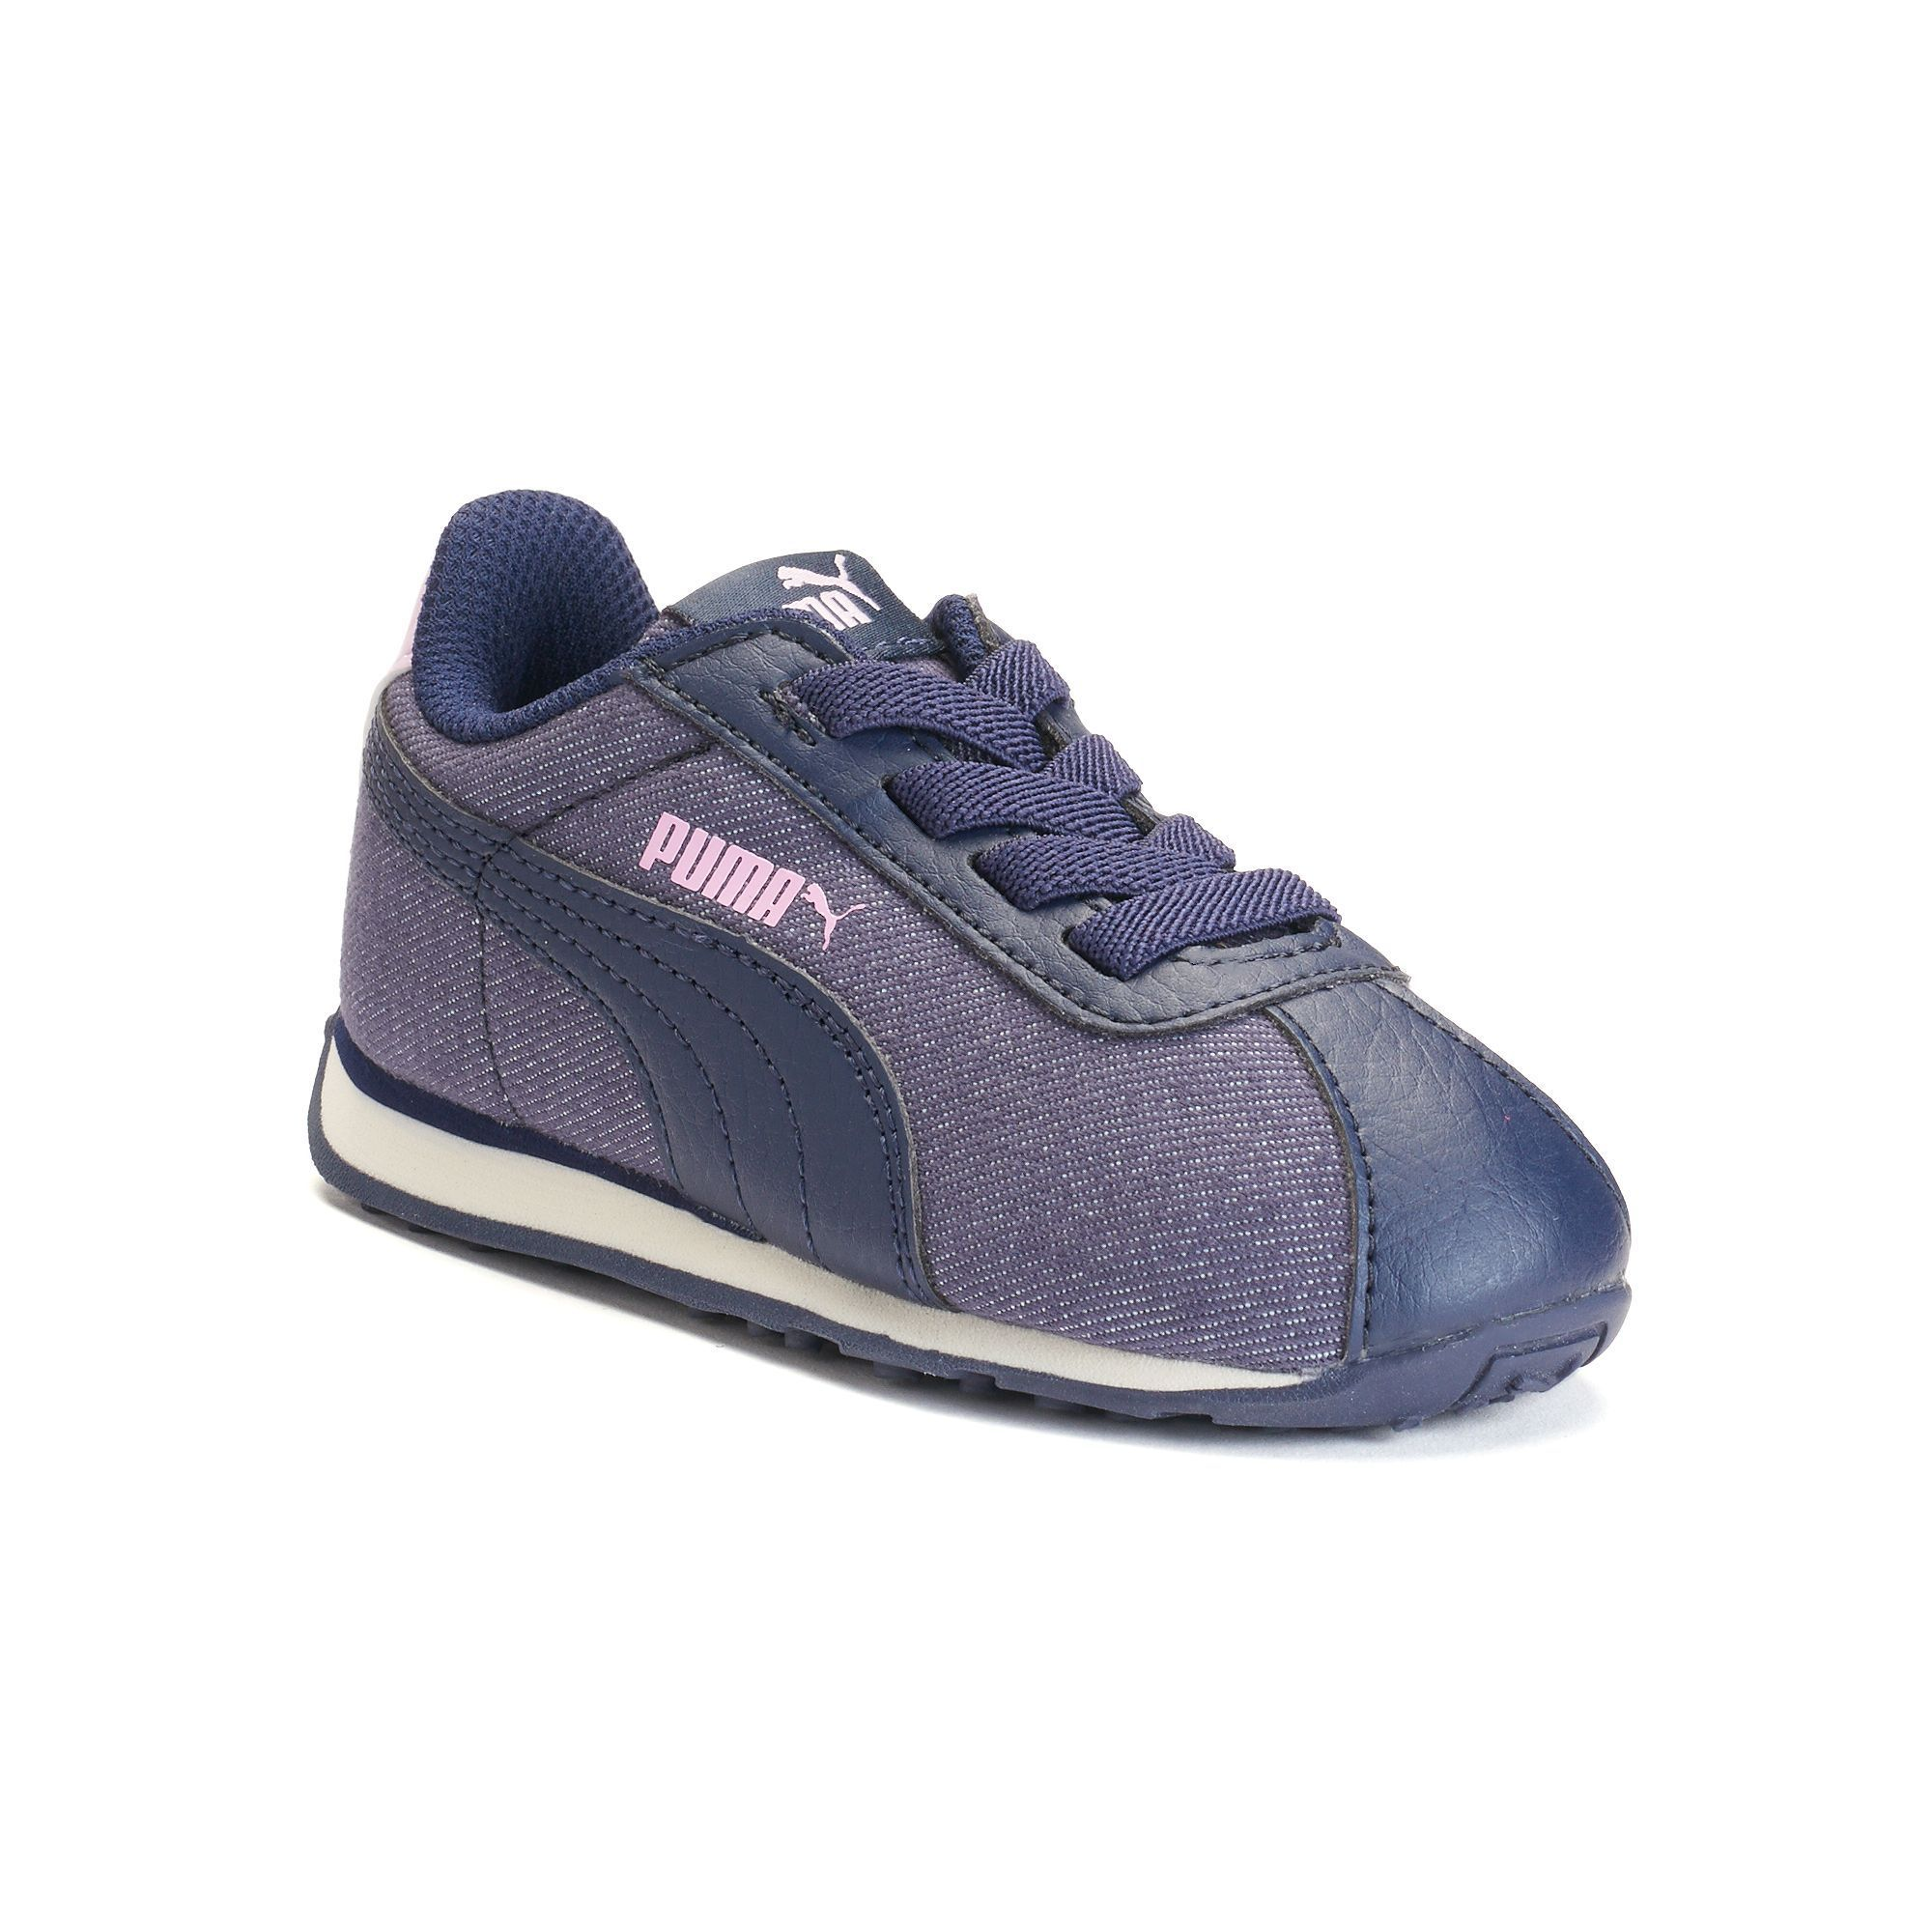 5ad453ed5edc PUMA Turin Denim AC Toddler Girls  Shoes